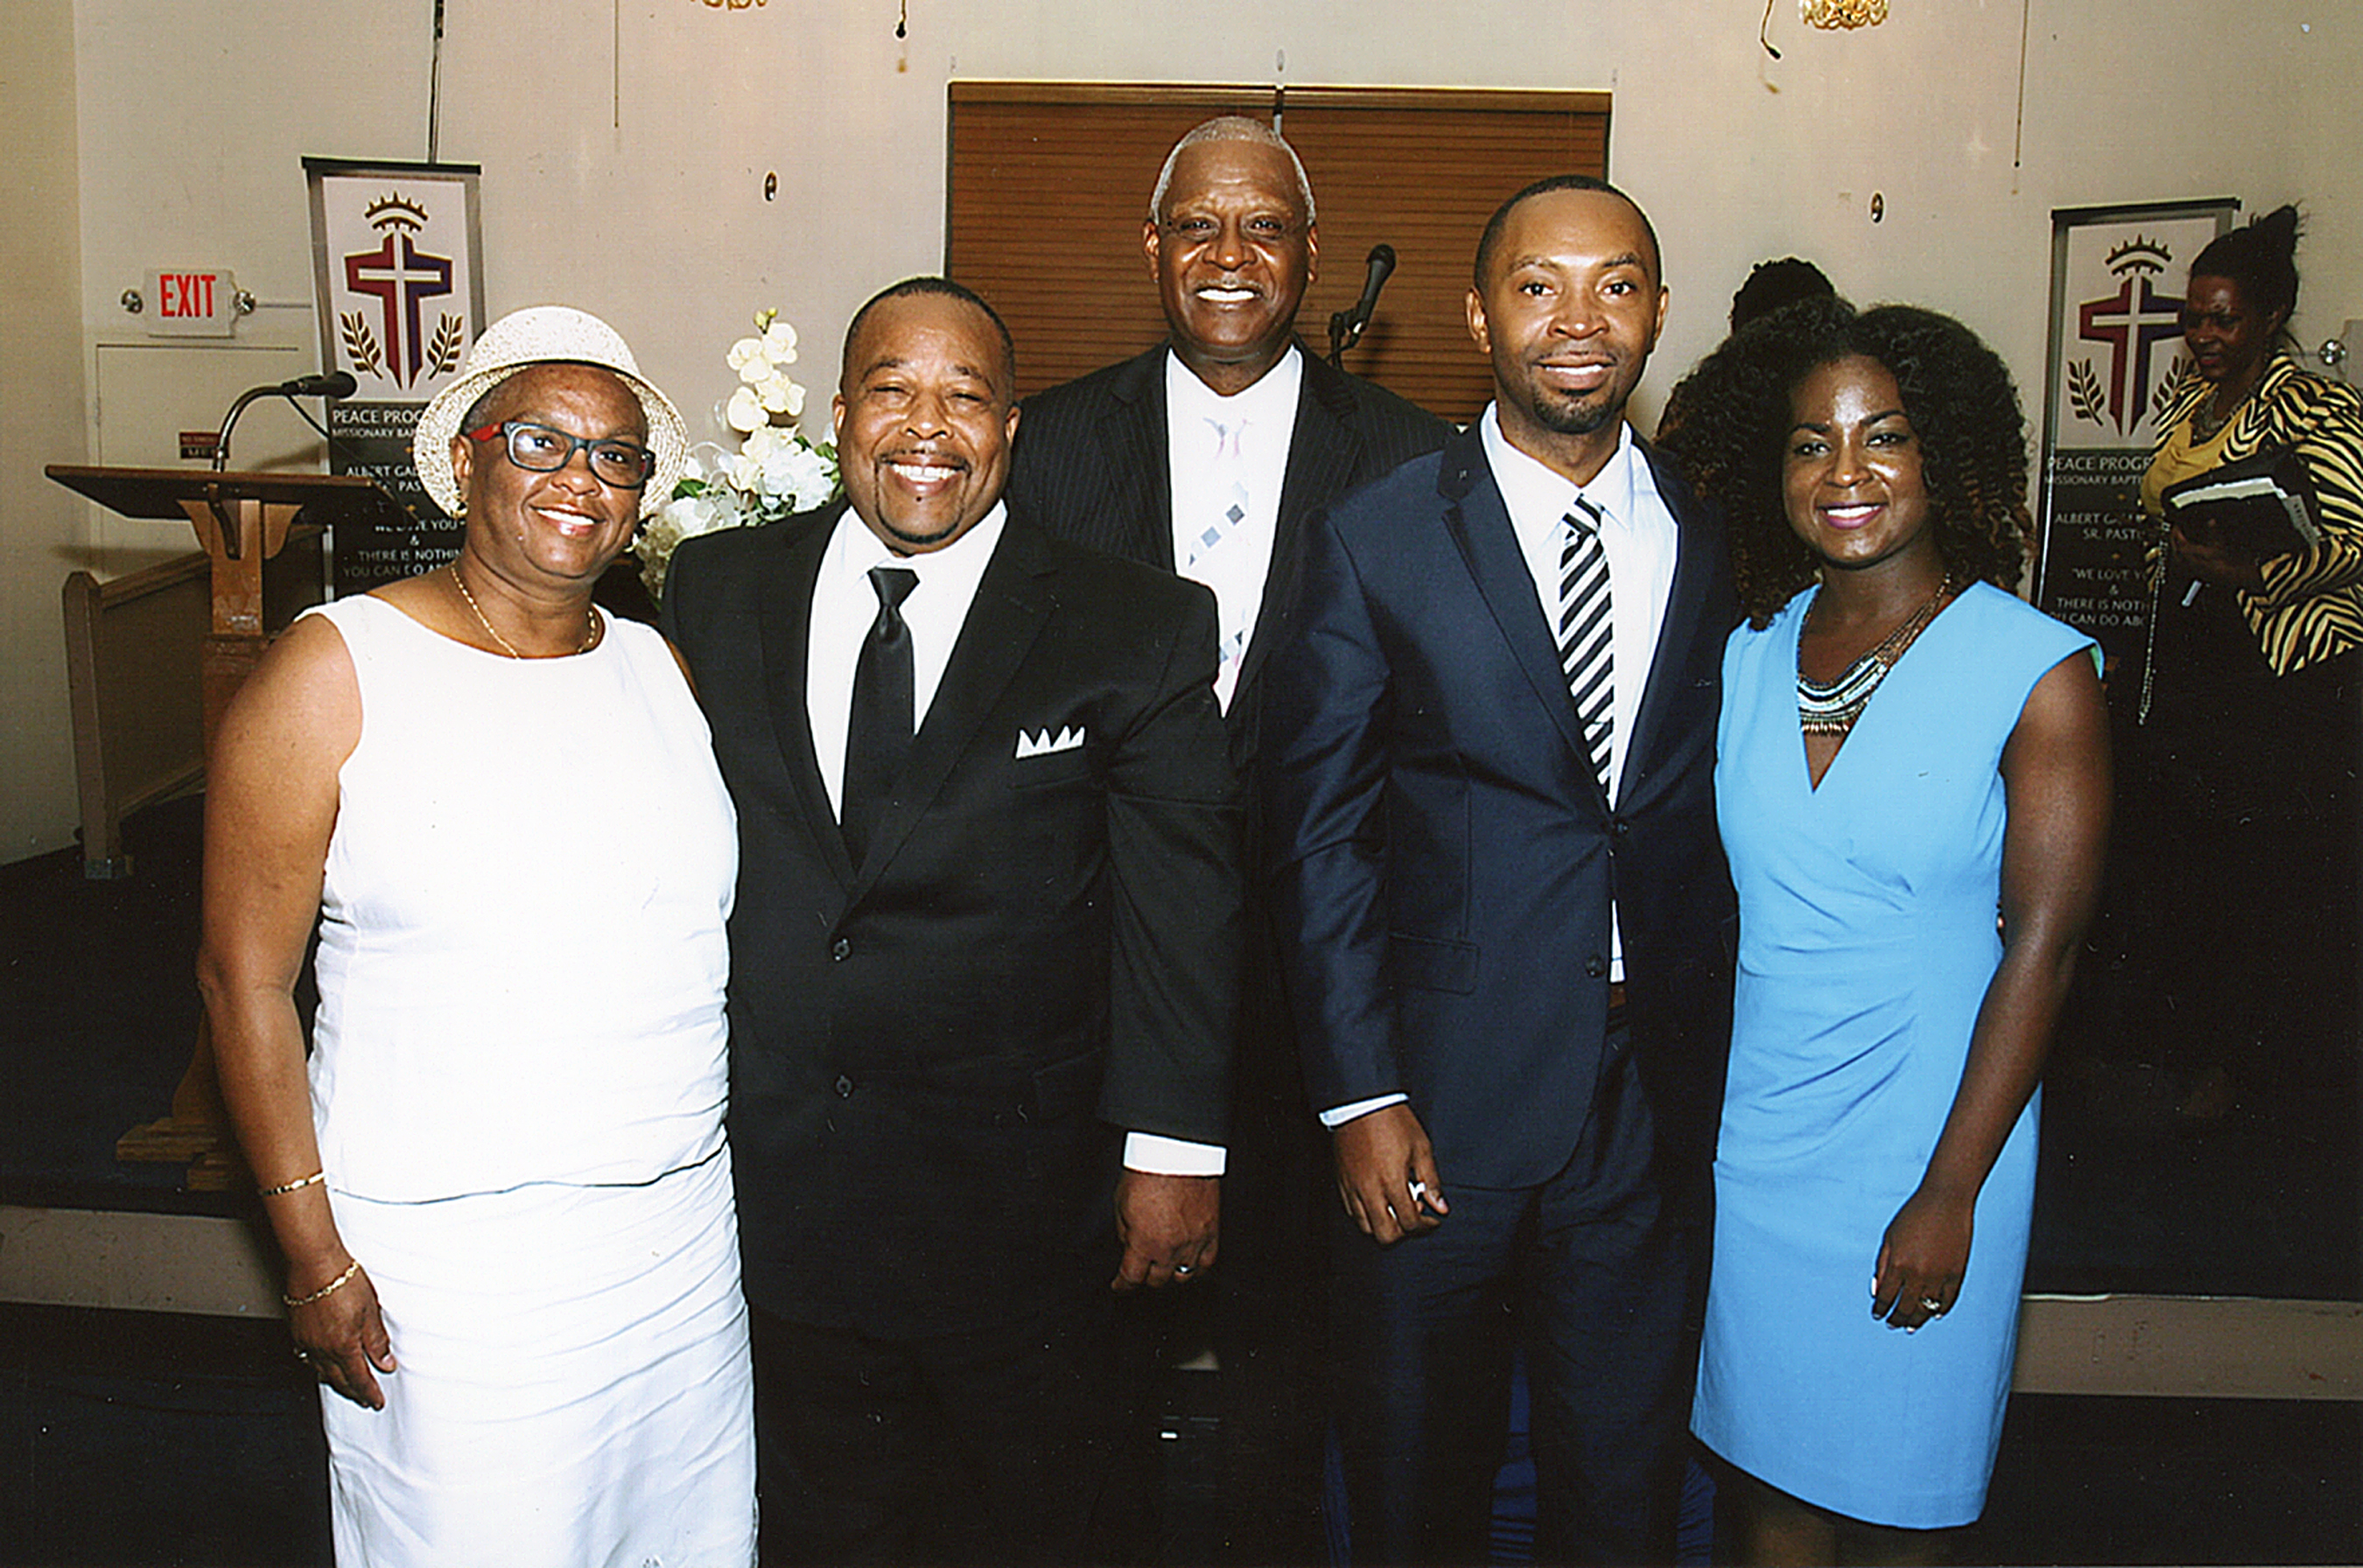 PEACE MISSIONARY BAPTIST CHURCH HOSTS ORDINATION SERVICE